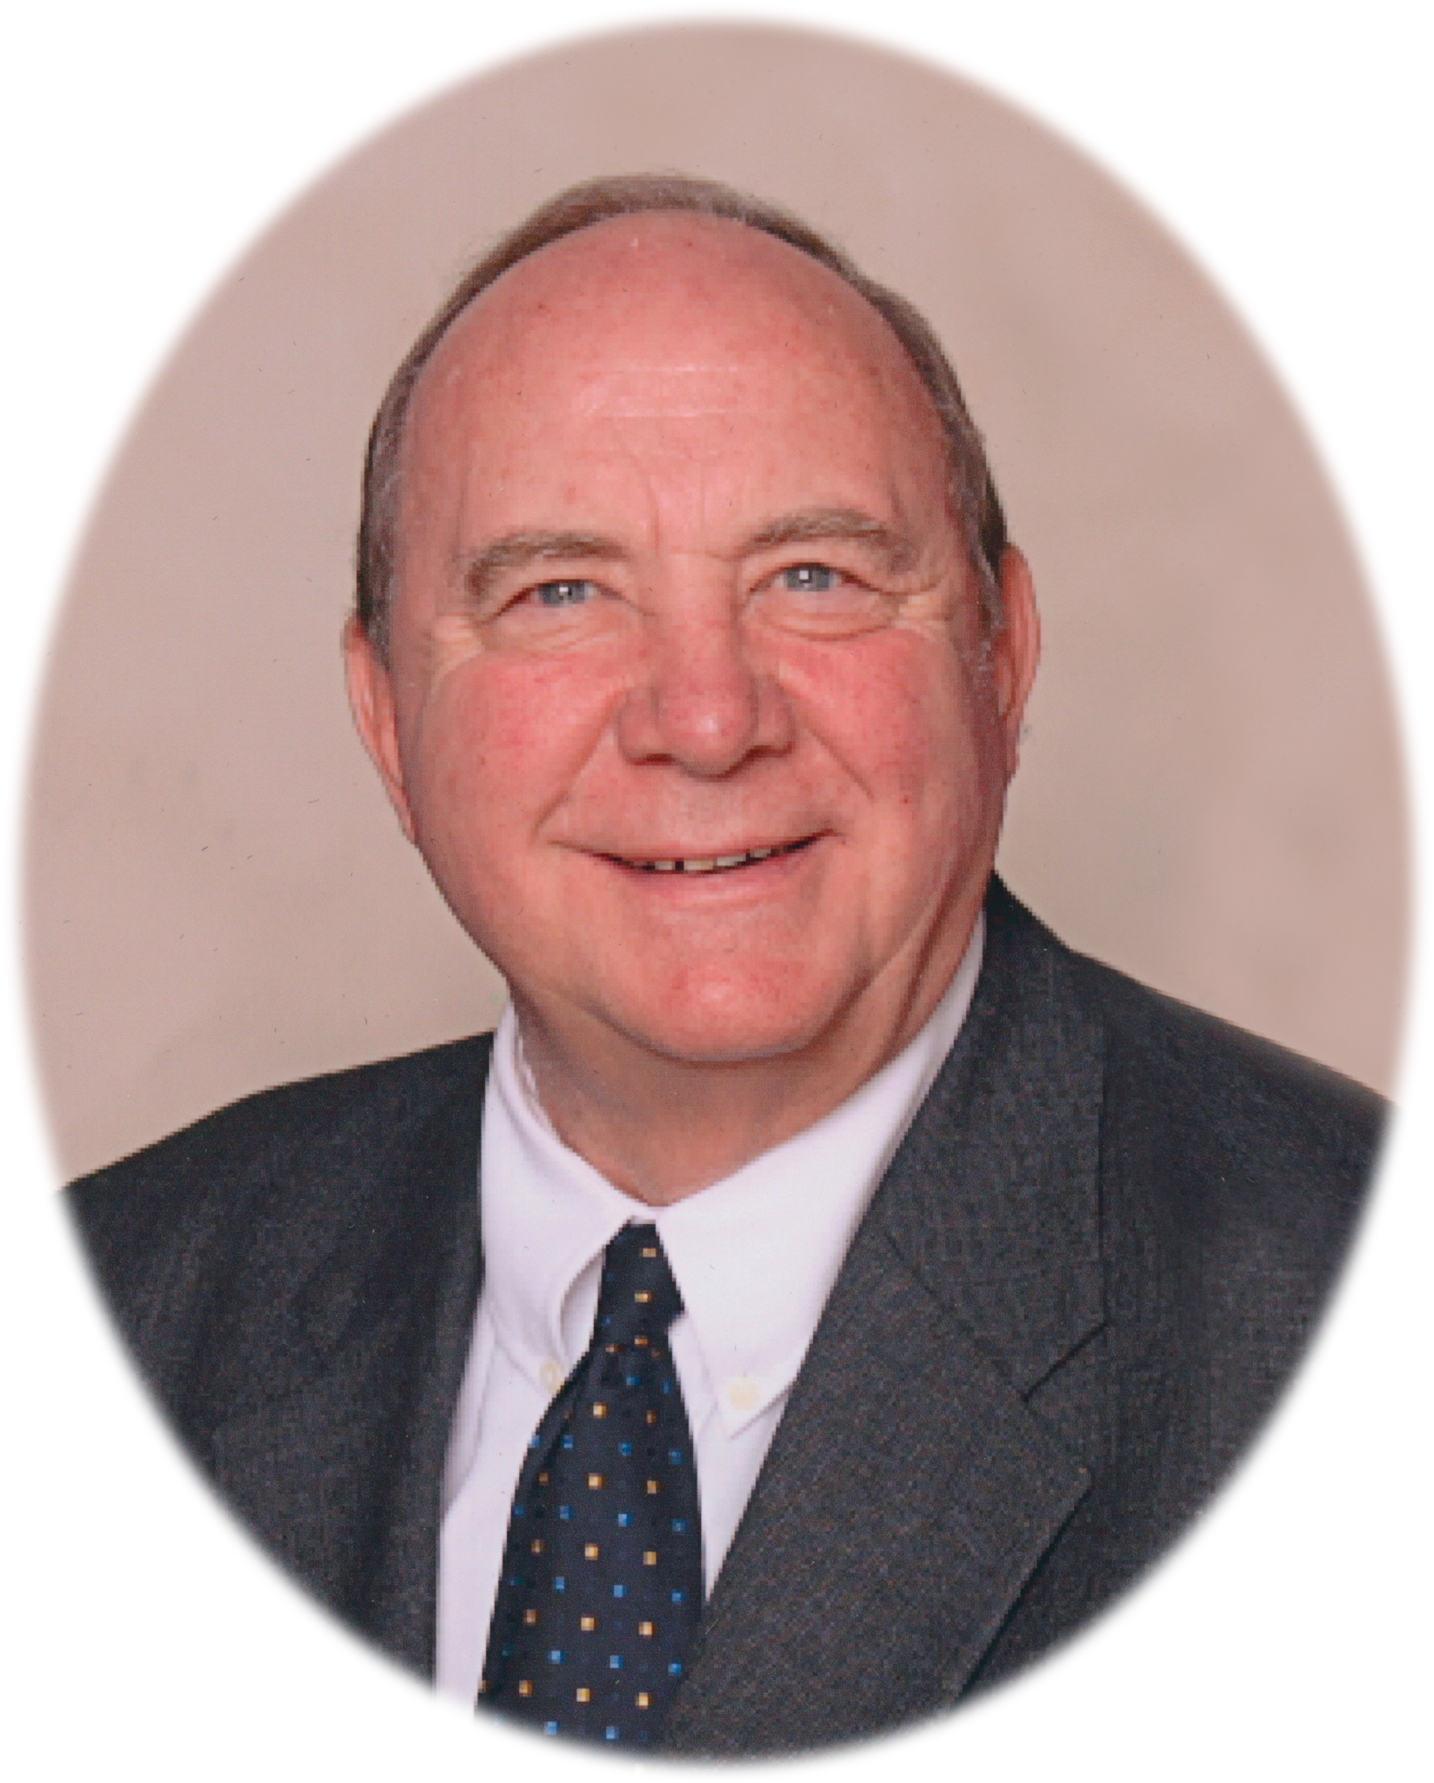 William F. Farrell